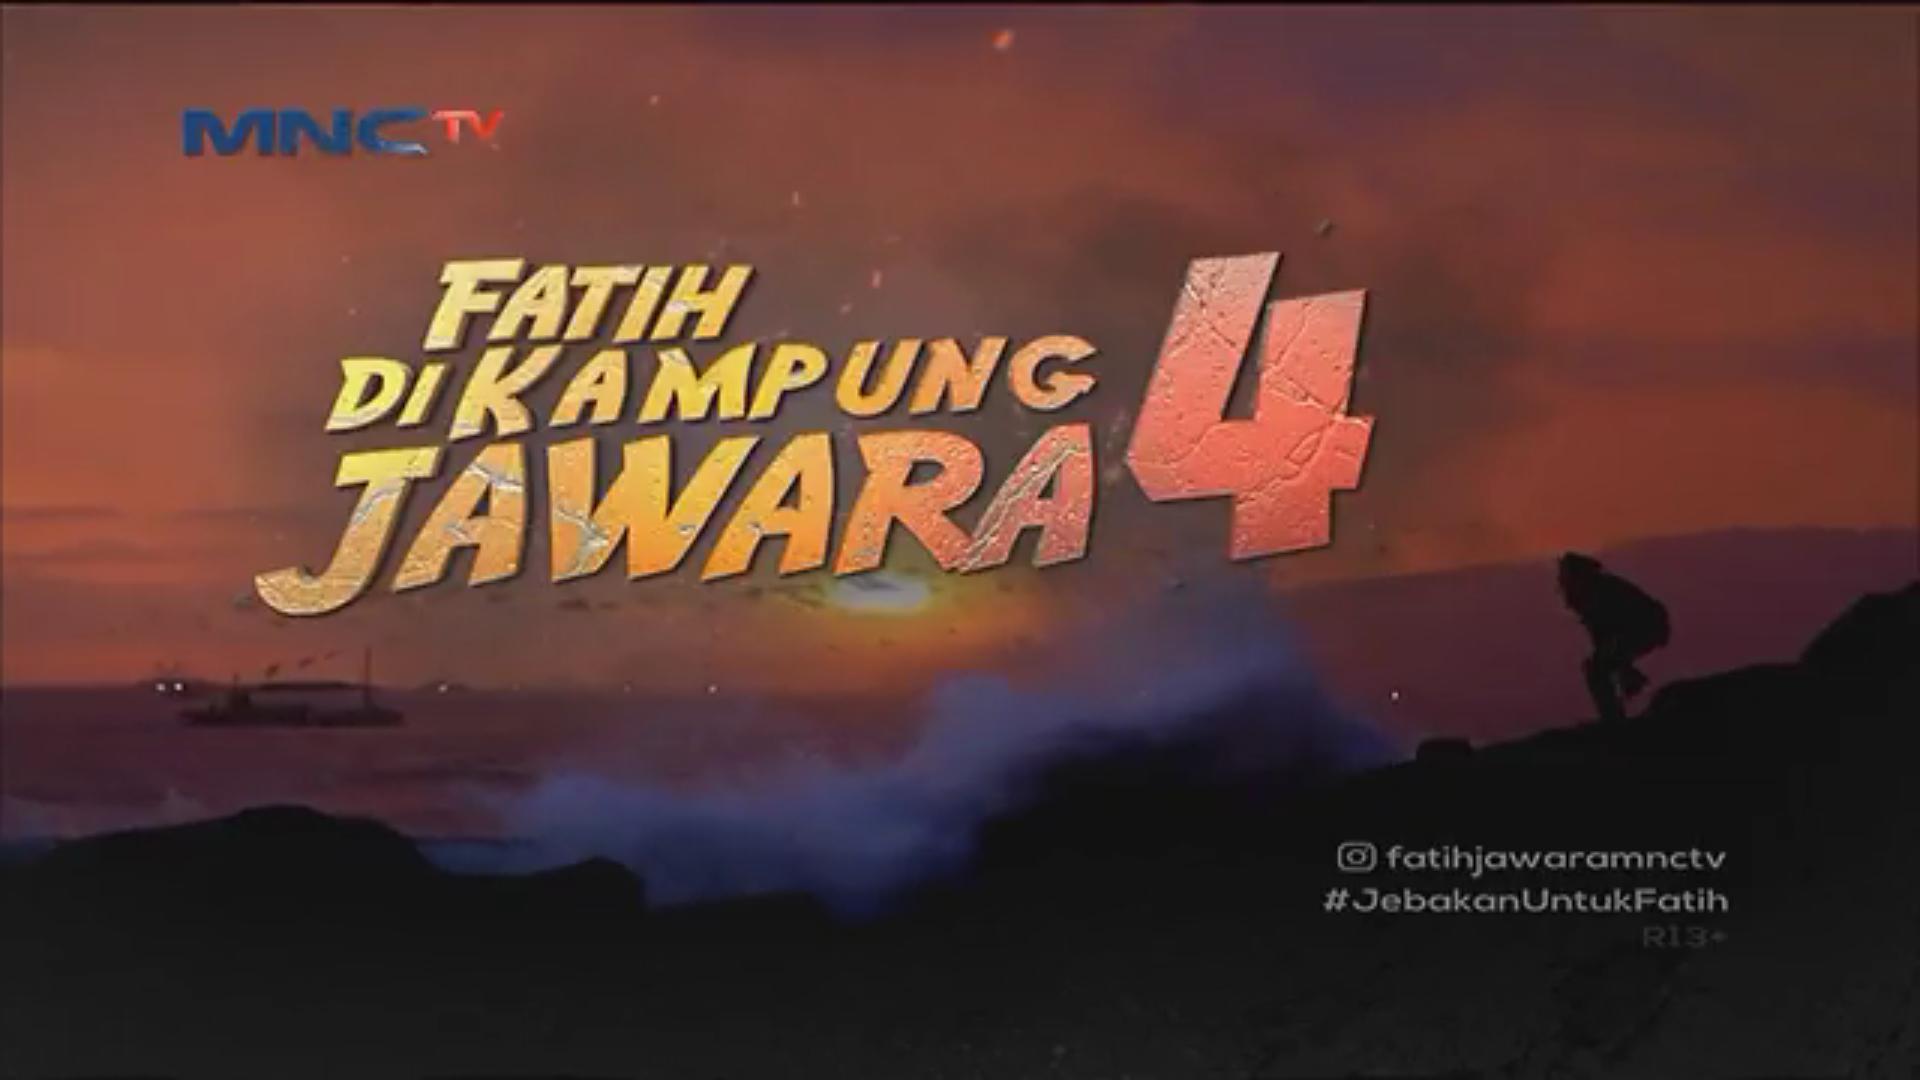 Fatih di Kampung Jawara 4